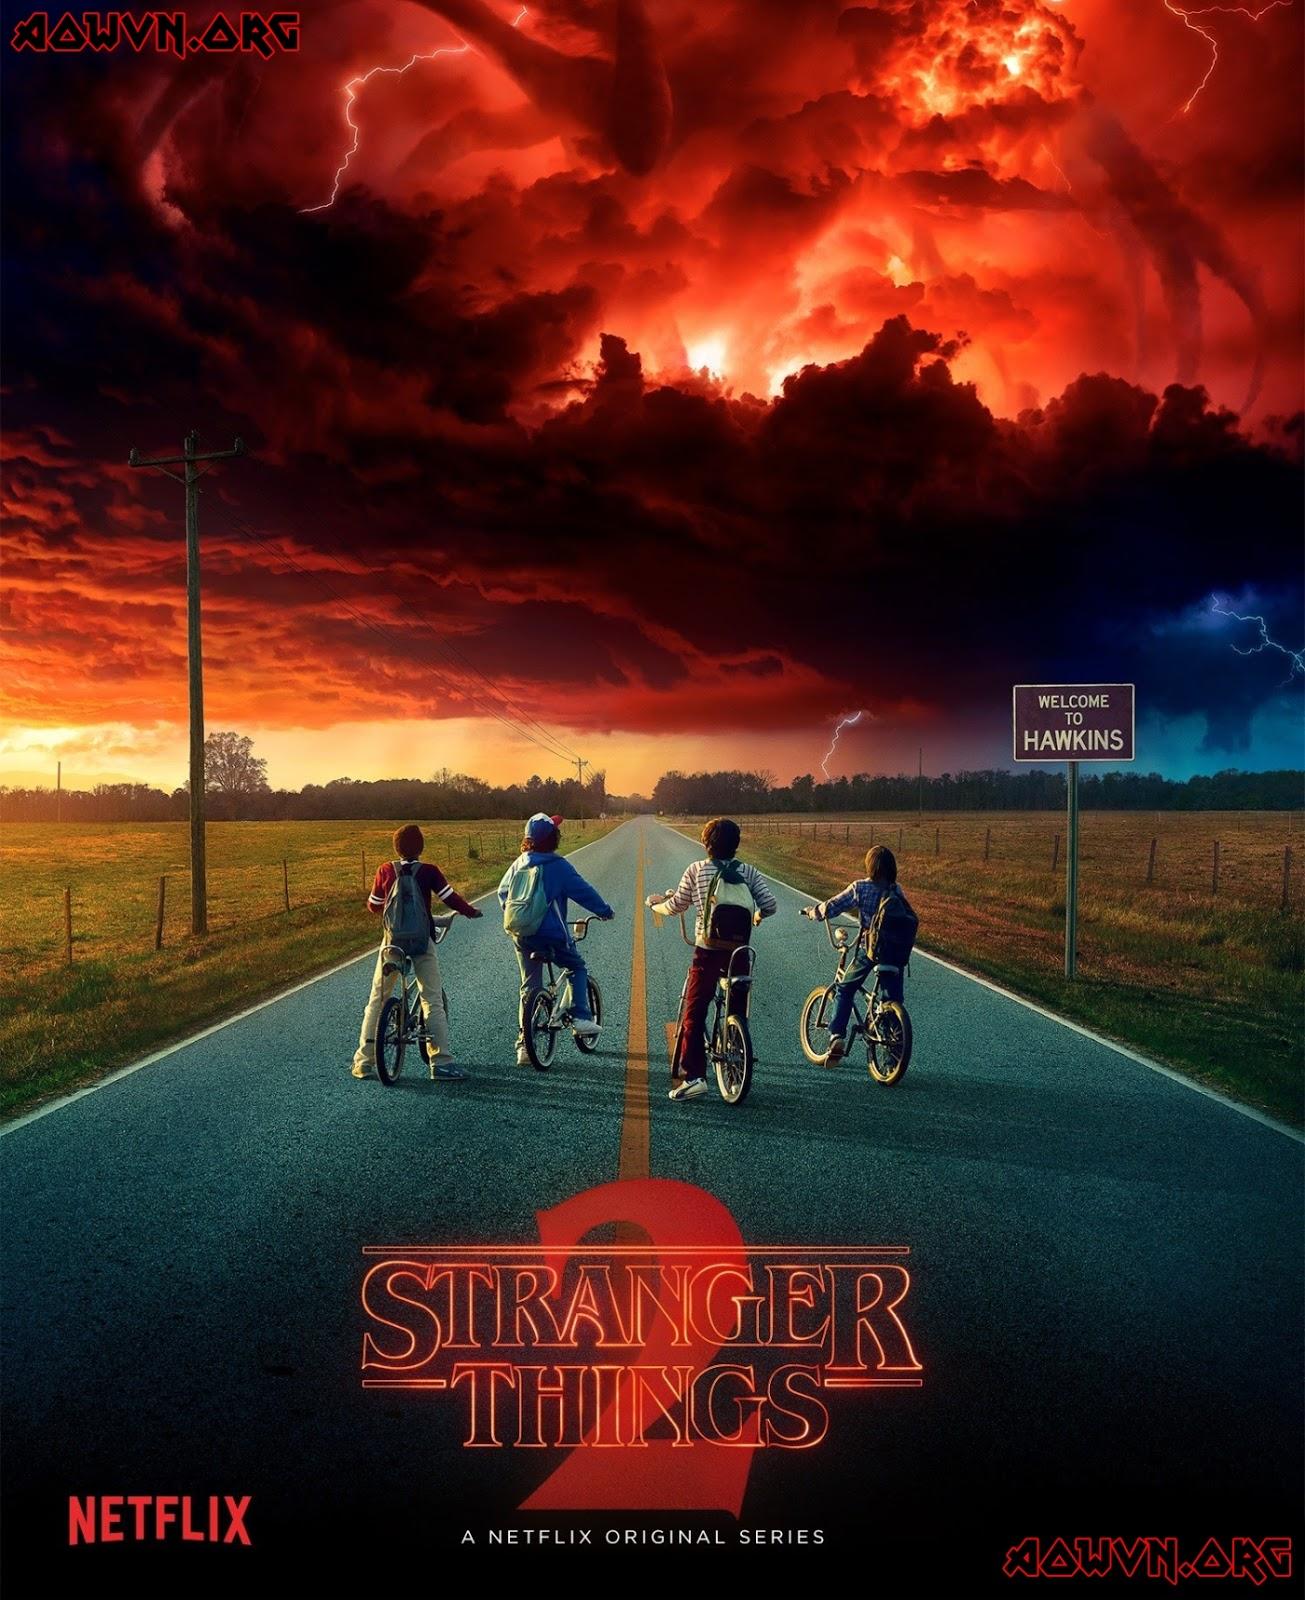 stranger things season 2 003 e1509682982899 - [ Phim 3gp Mp4 ] Stranger Things SS1 + SS2 | Vietsub - Siêu phẩm Netflix - Kinh Dị - Viễn Tưởng